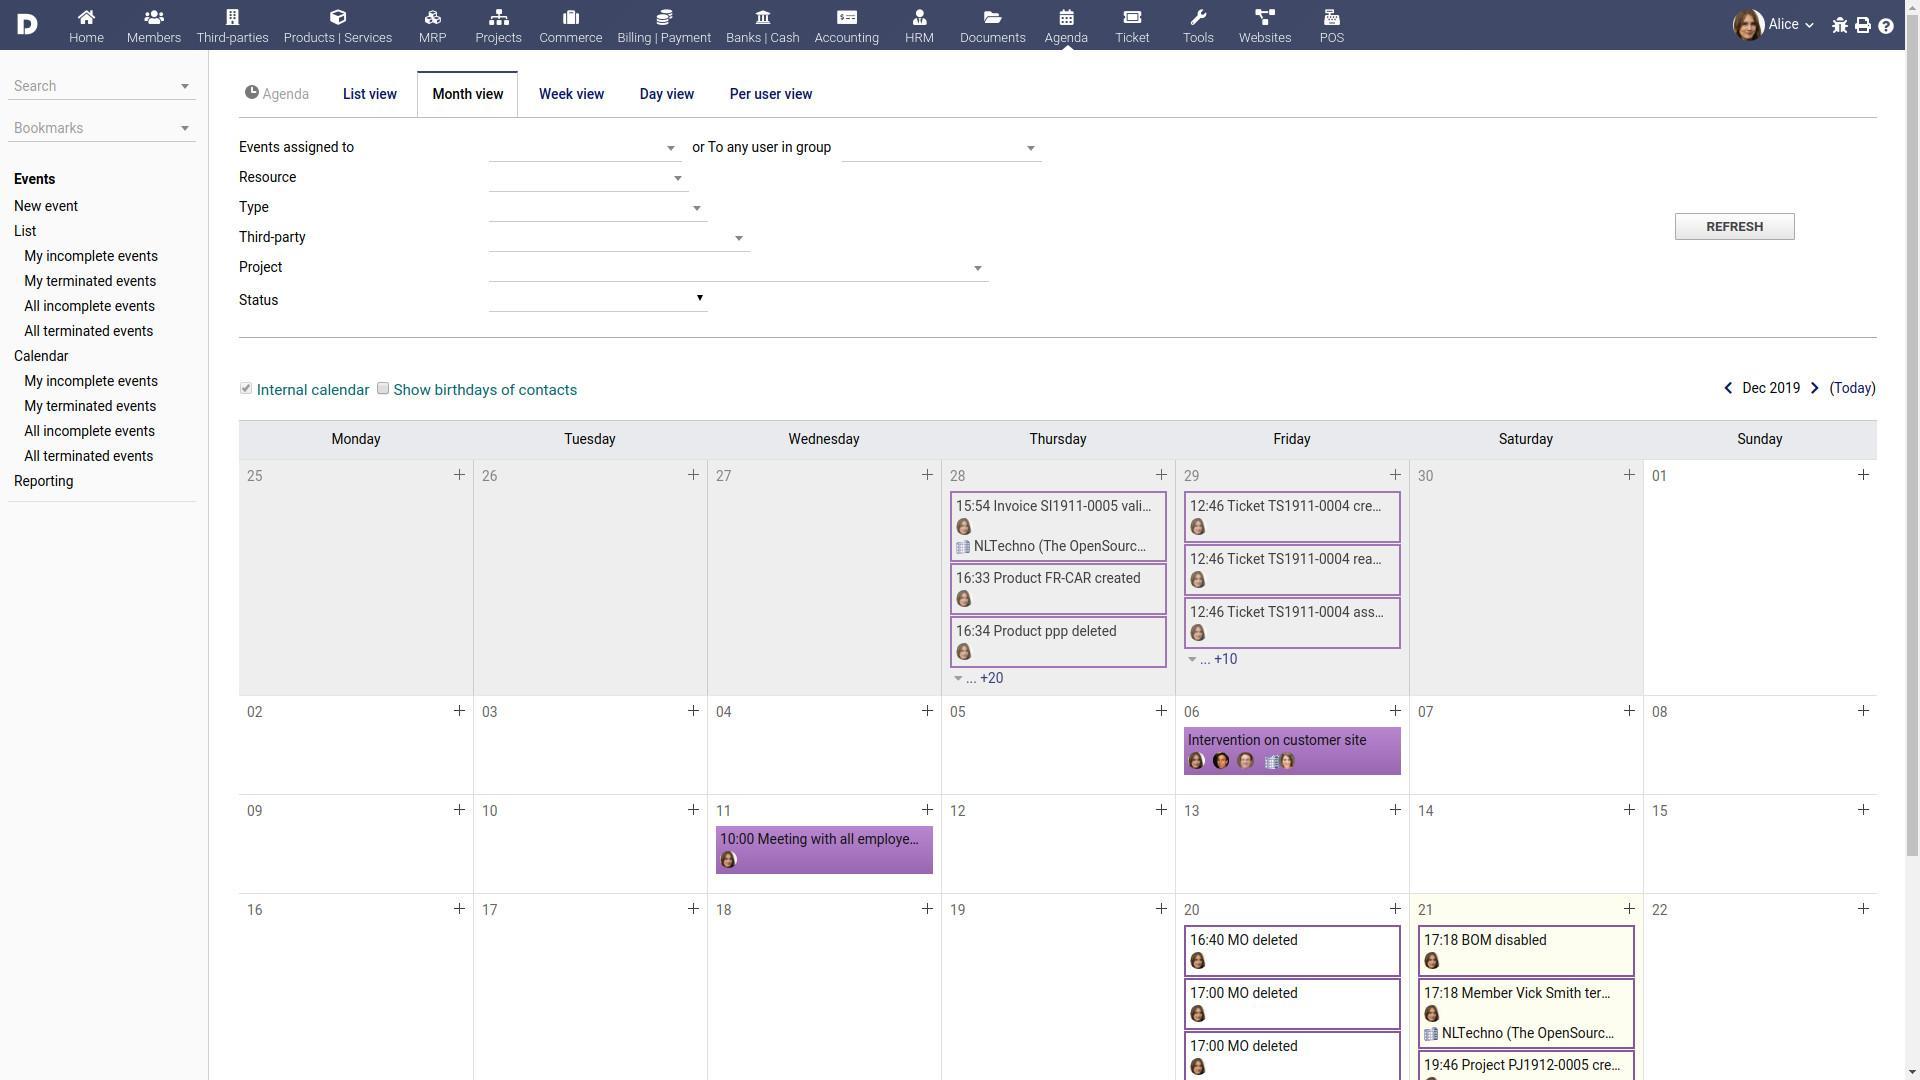 The calendars